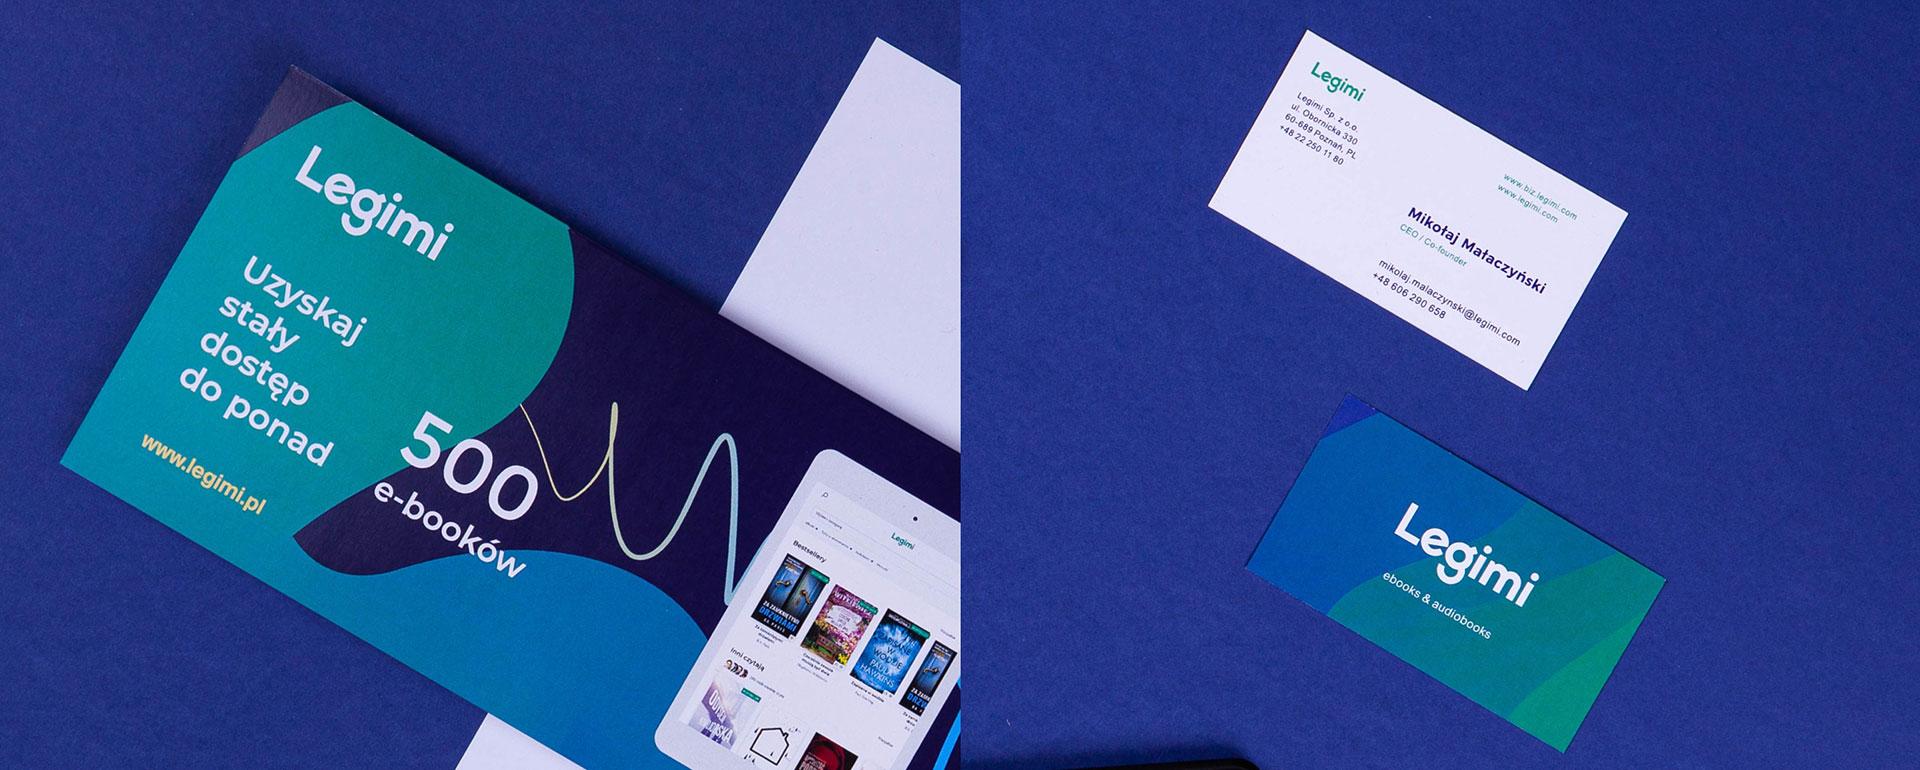 Print design - Legimi by Uniforma